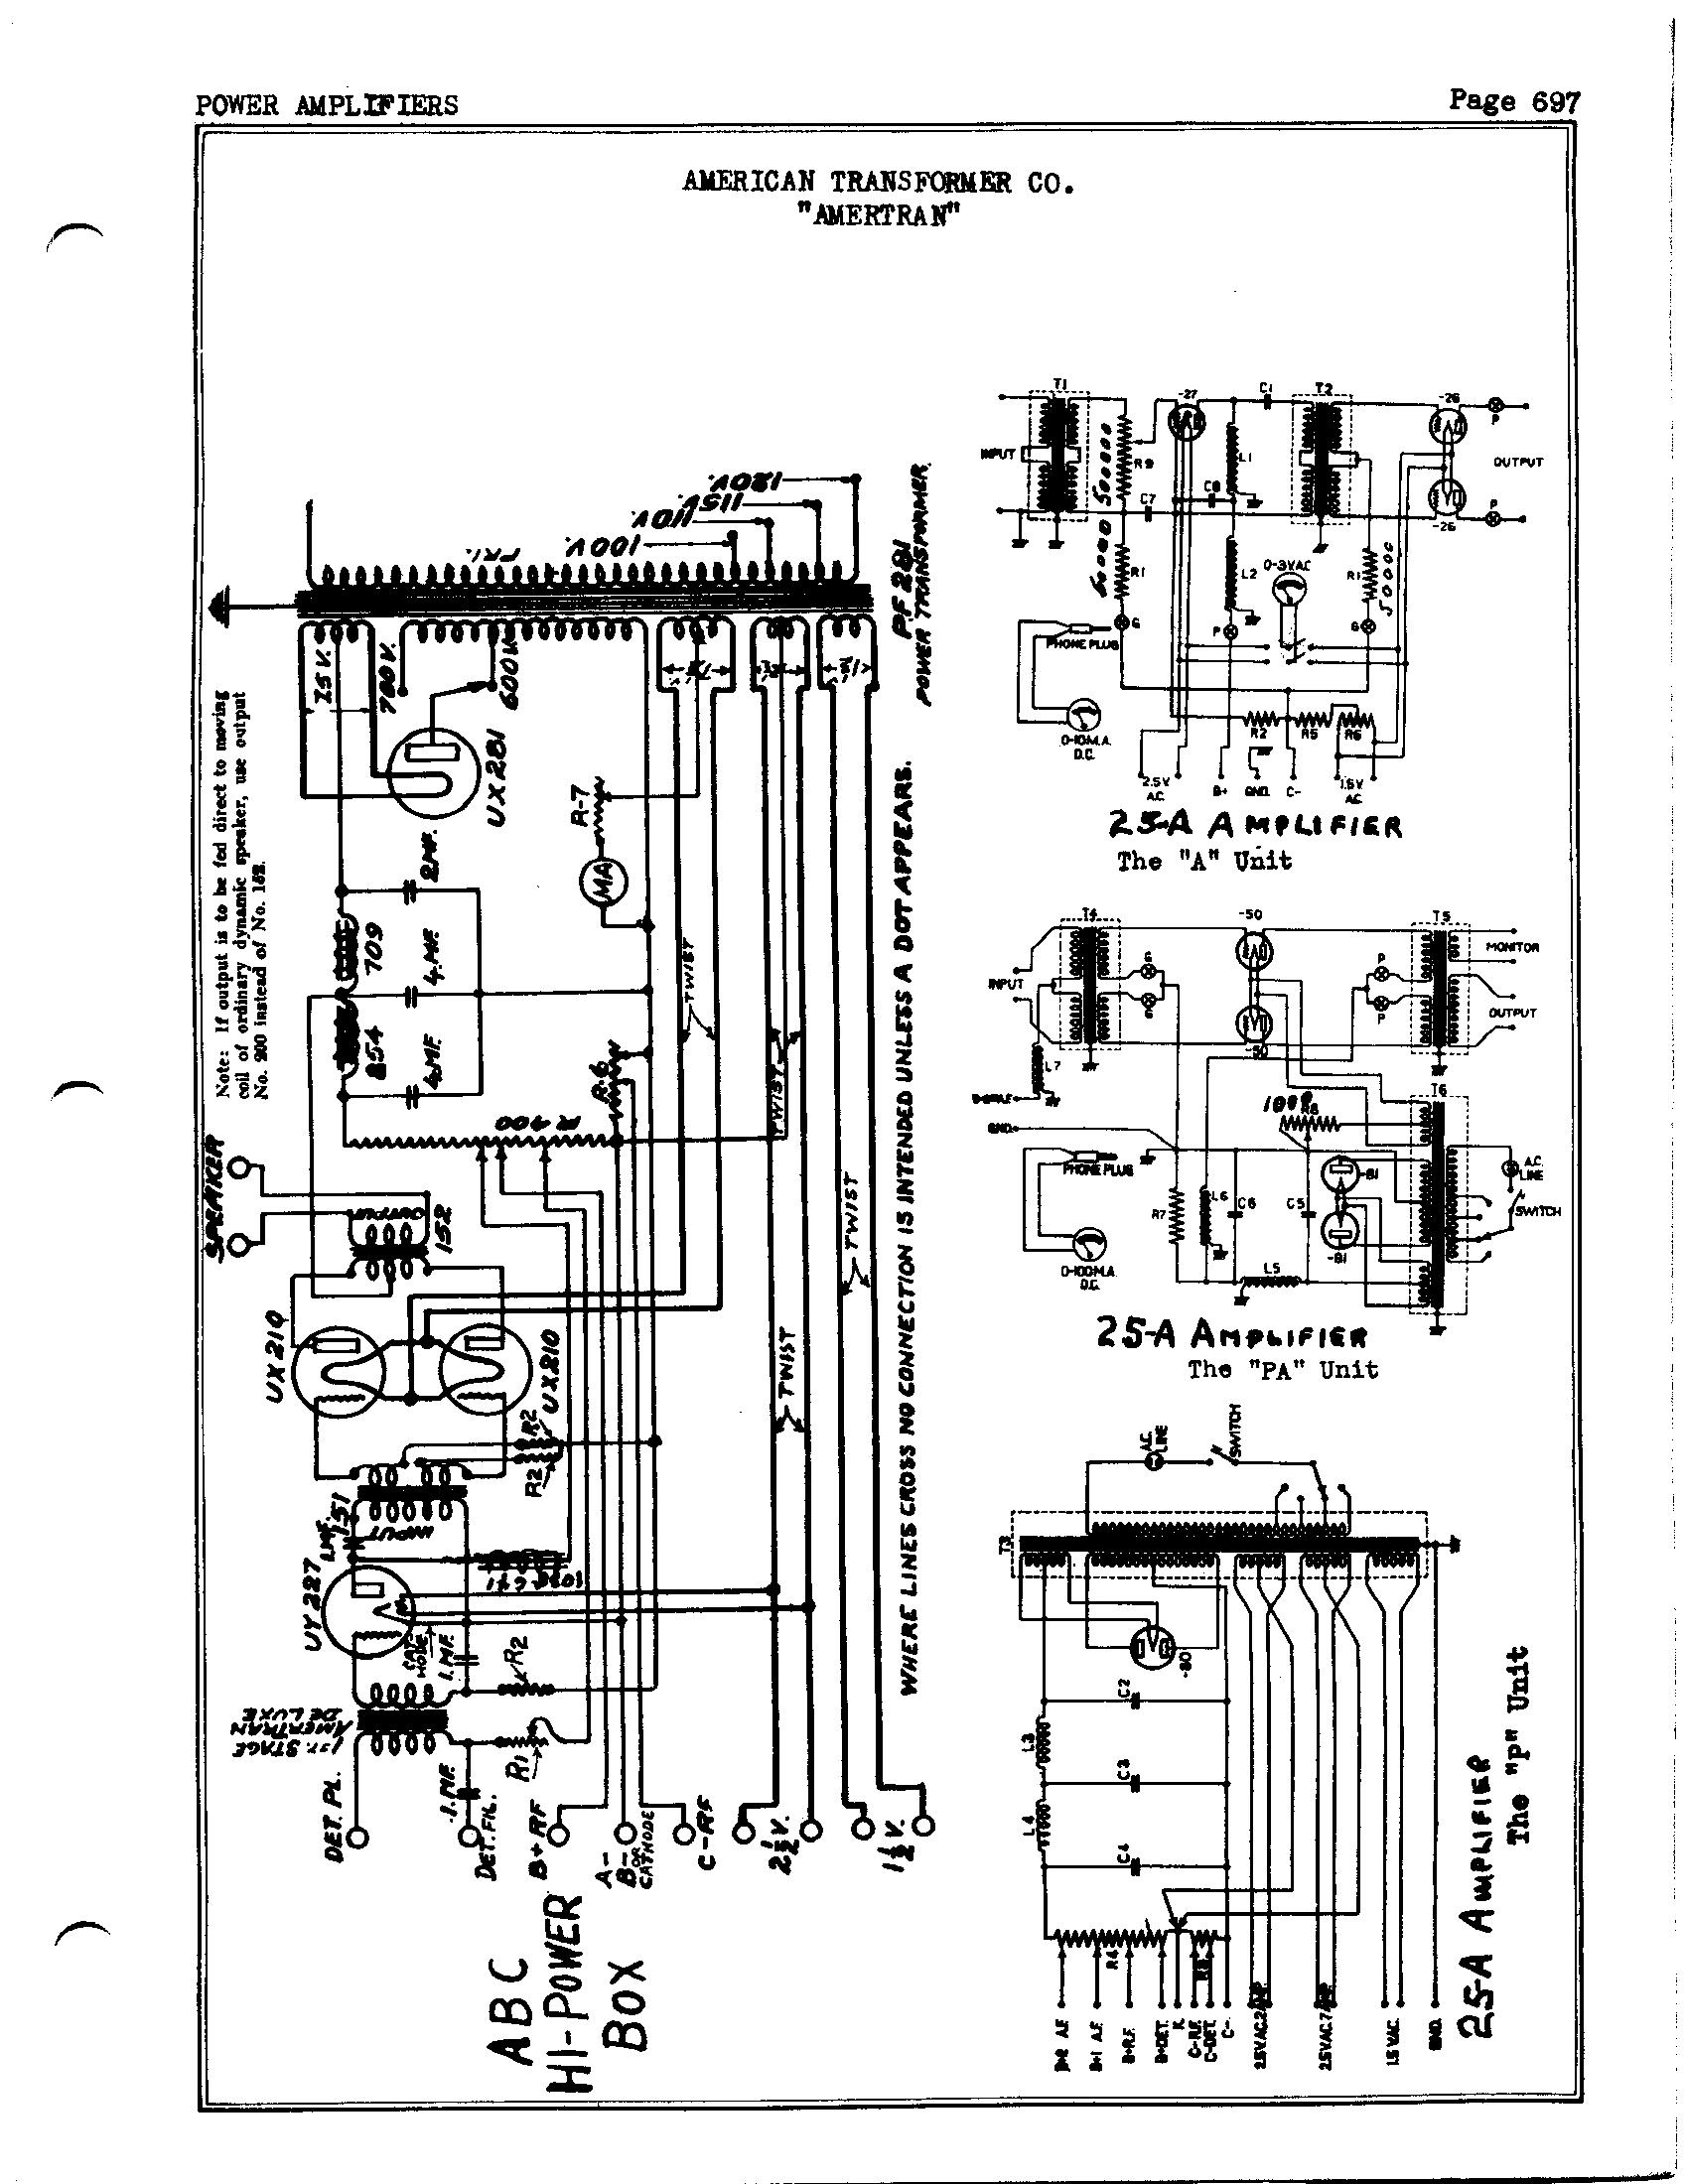 American Transformer Co Amertran Antique Electronic Supply